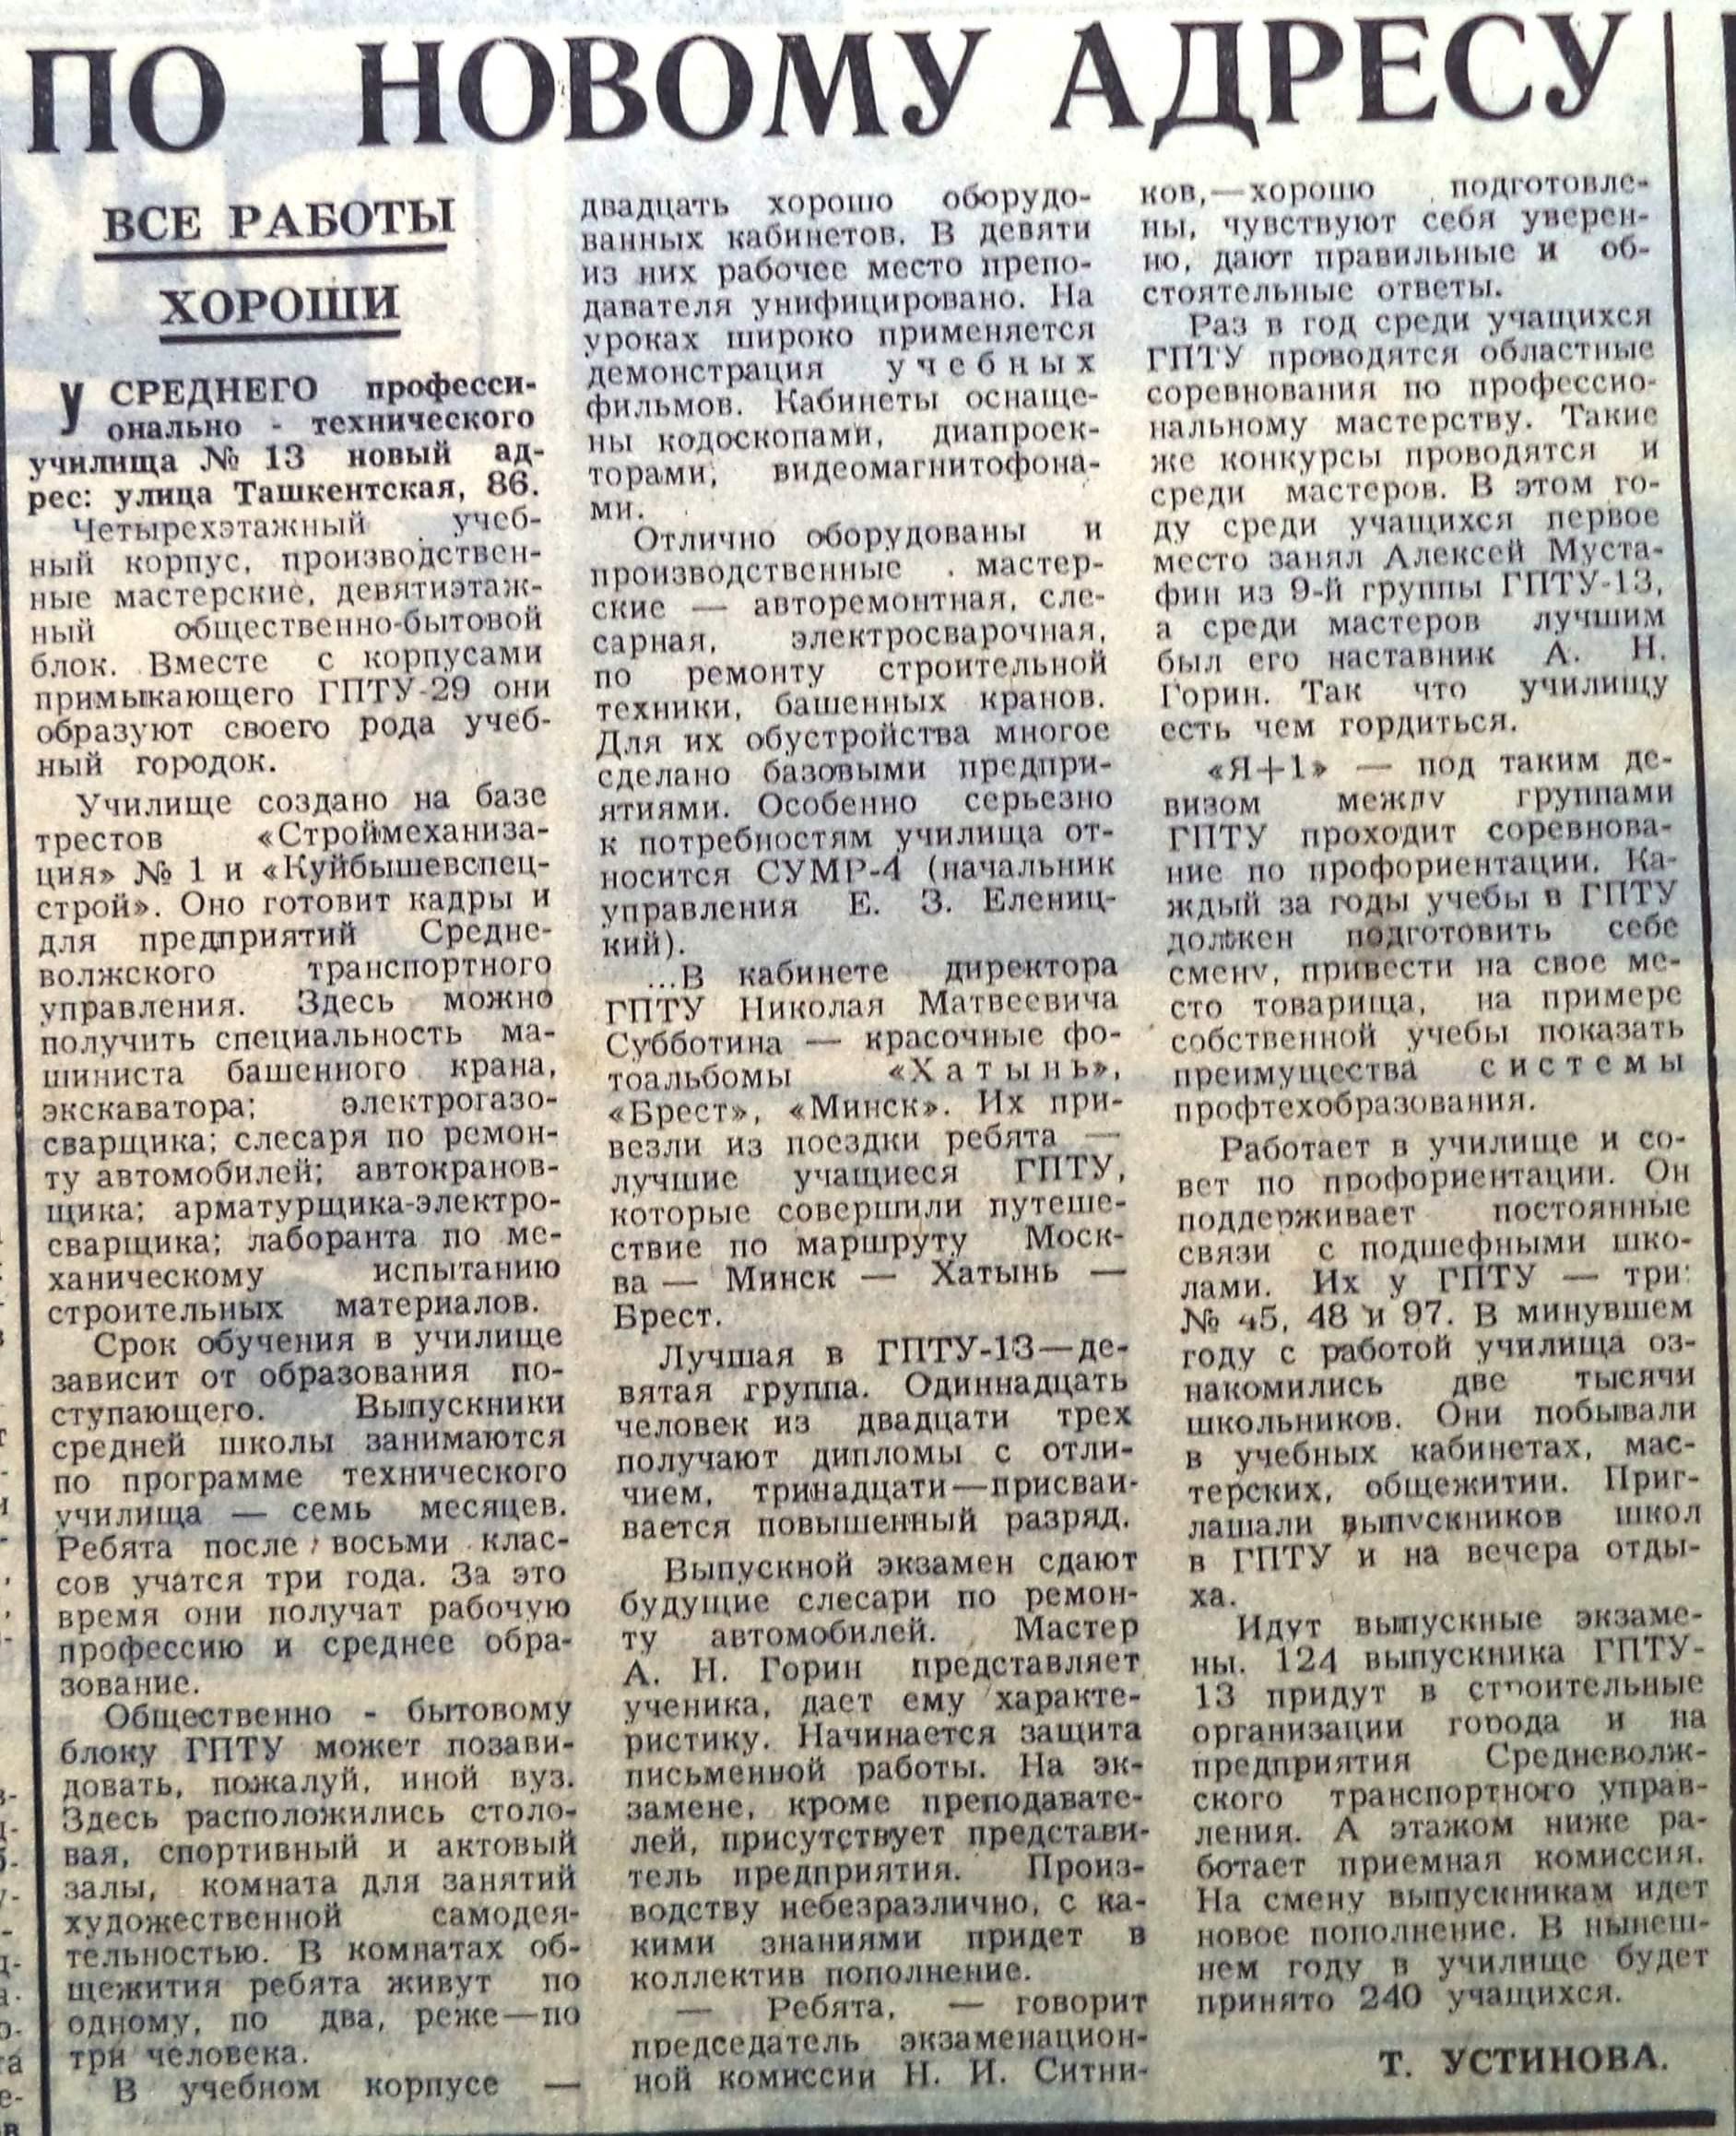 Ташкентская-ФОТО-69-ВЗя-1983-08-08-новосел. СГПУ-13 на Ташк.-86-min